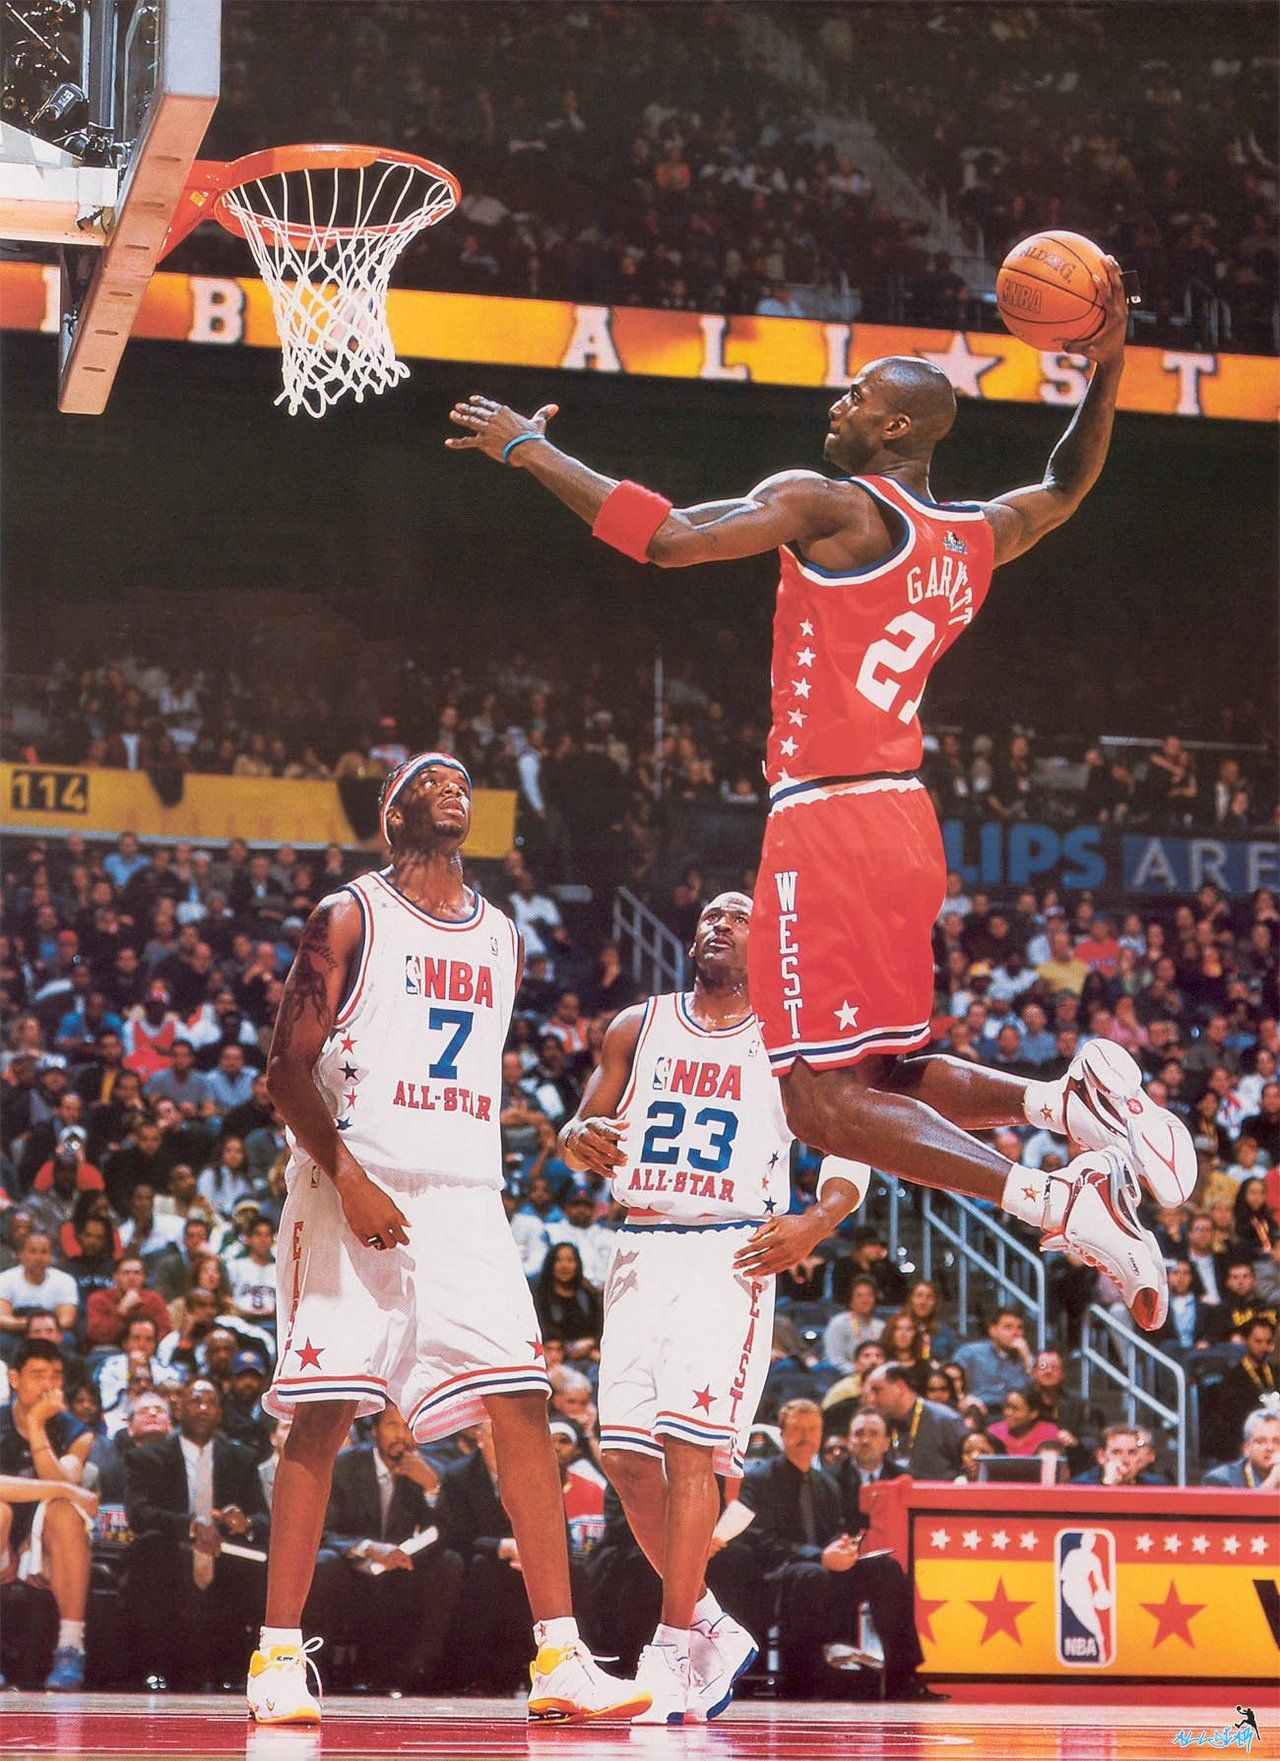 a1e009f001d Kevin Garnett Jermaine O Neal Michael Jordan NBA All-Star Game